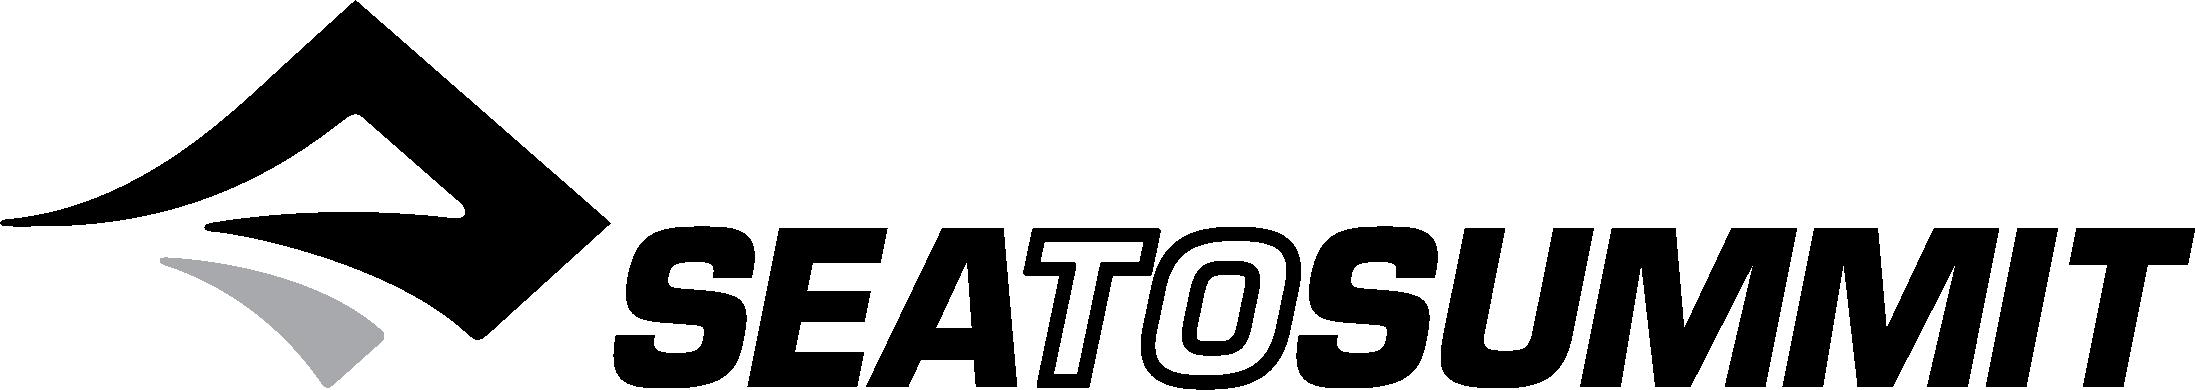 Sea to Summit 2017 Logo_inline_black_grey 2.png